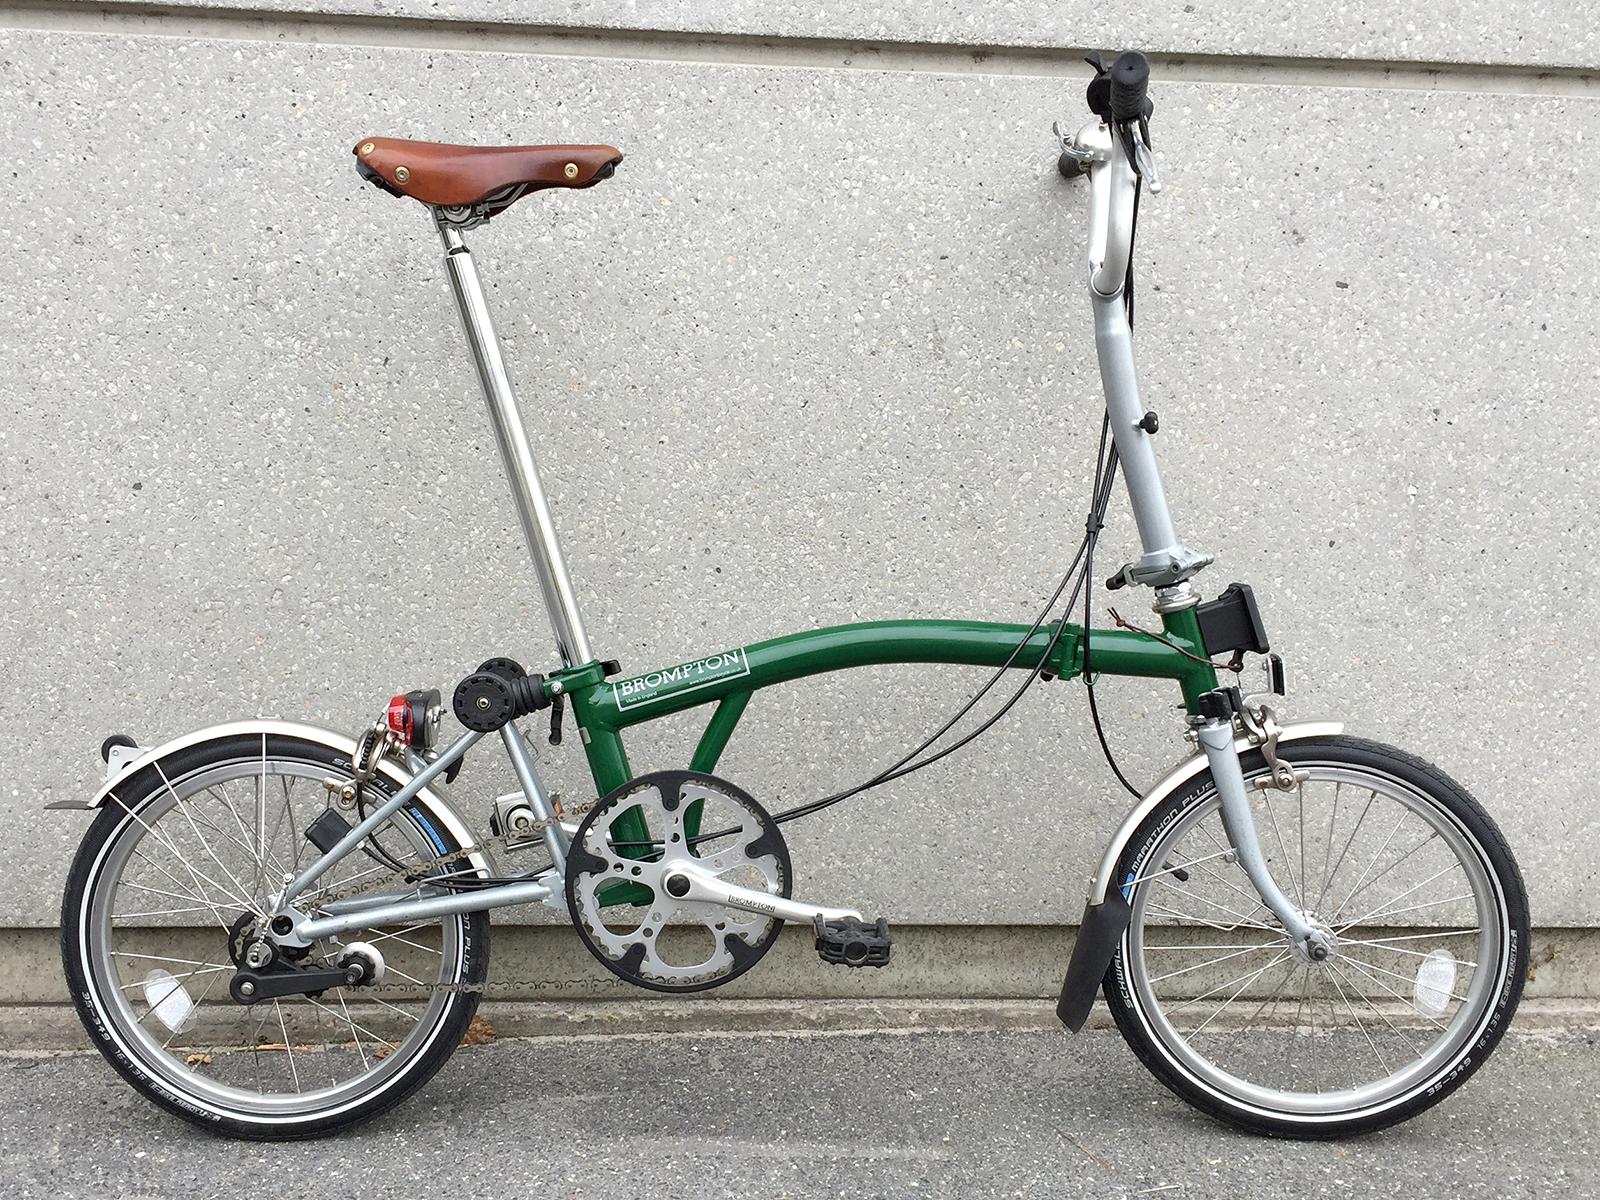 [Les B. de] MK90 (S6L-X ivoire, M3L racing green, …) 36206085134_d968d93b25_o